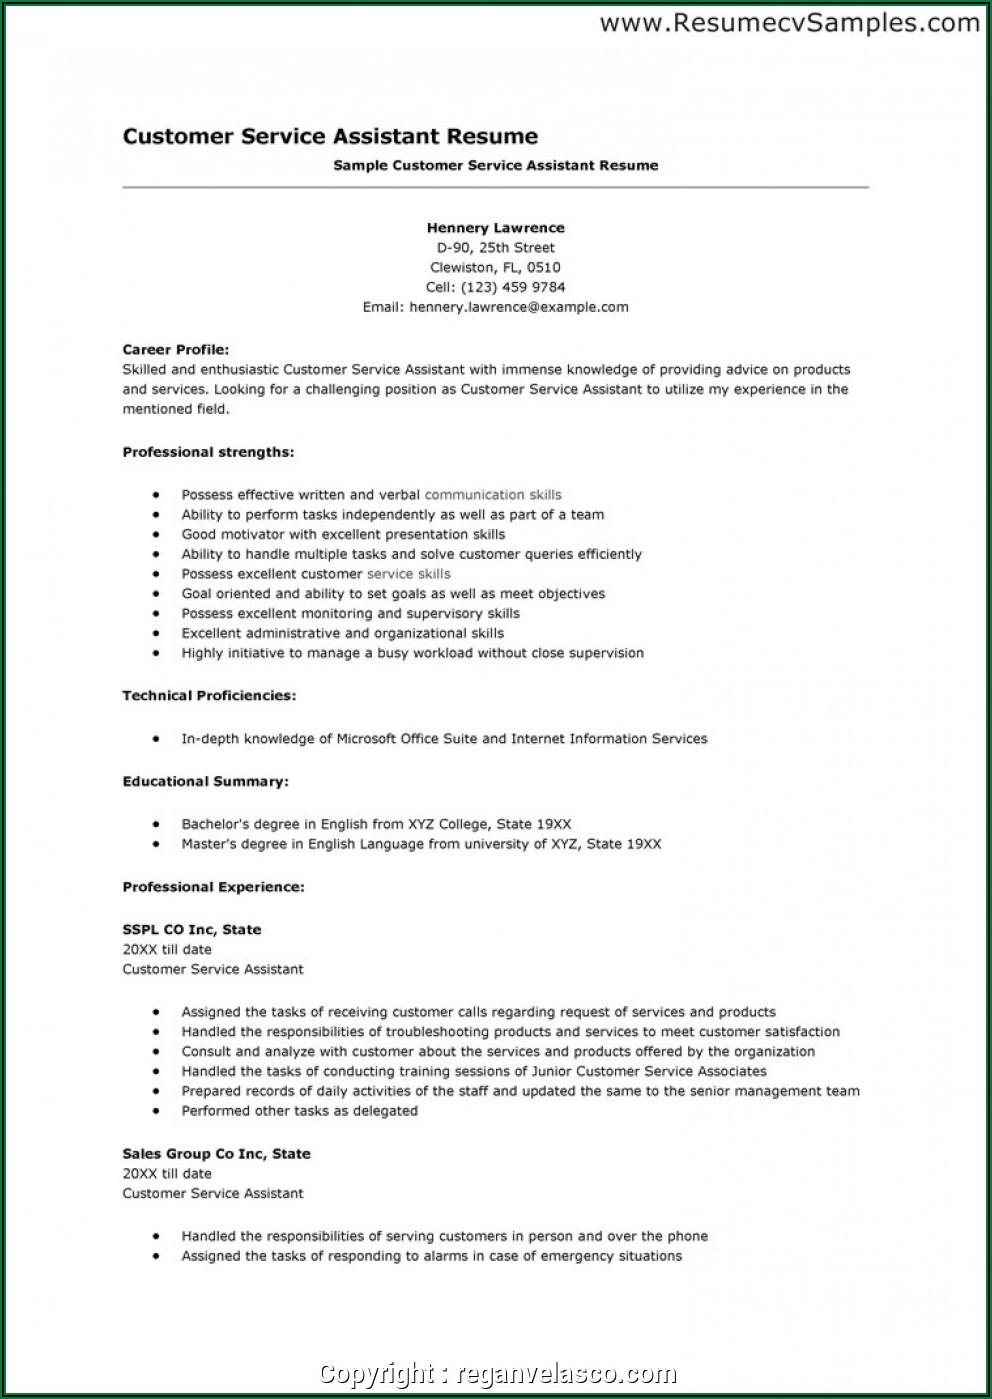 Free Sample Resume For Customer Service